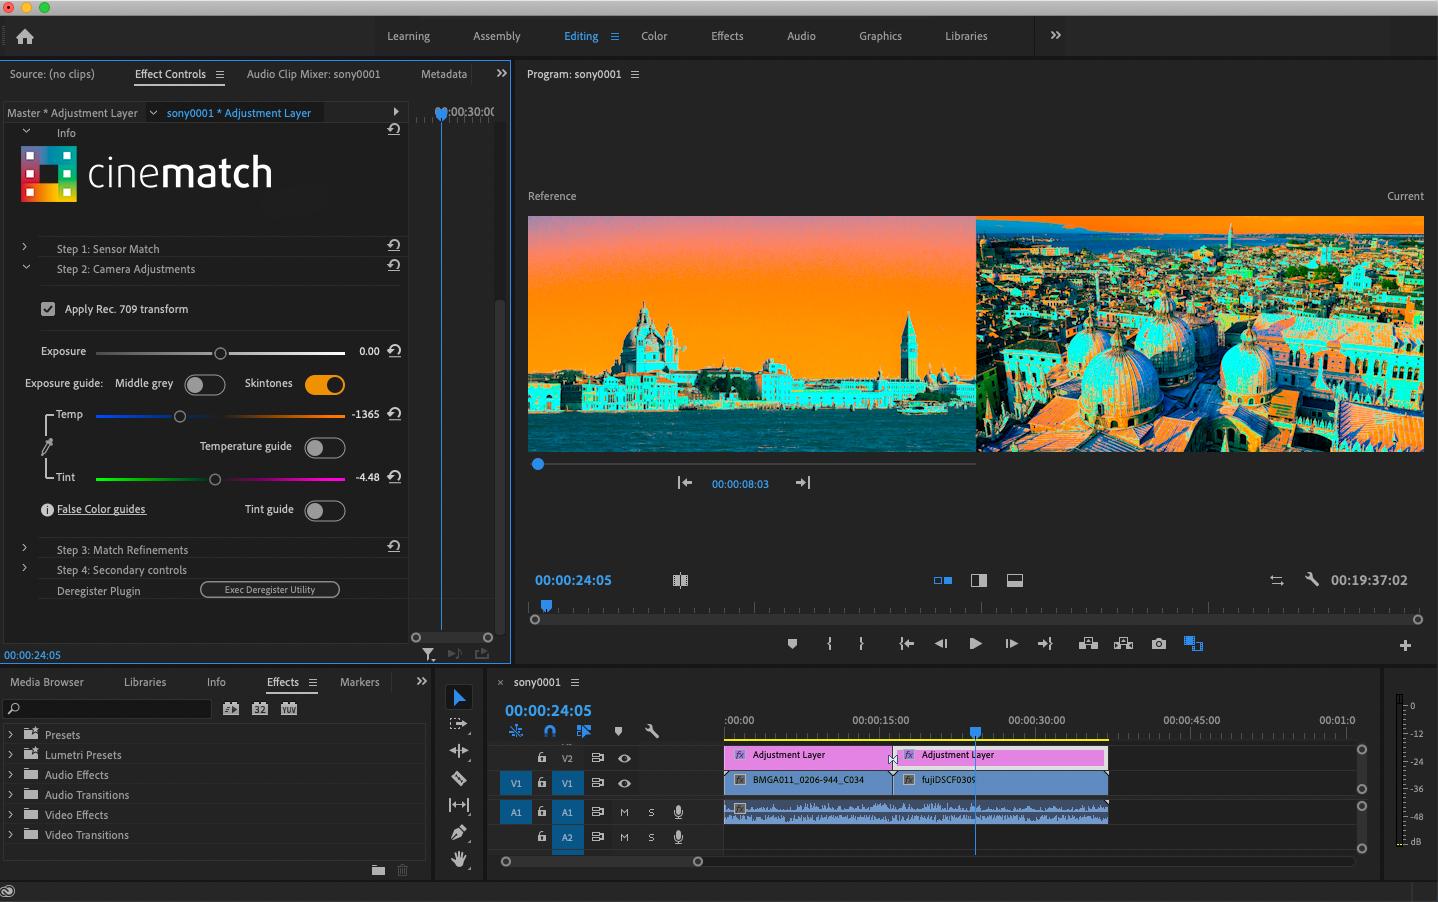 CineMatch in Adobe Premiere Pro false color guide